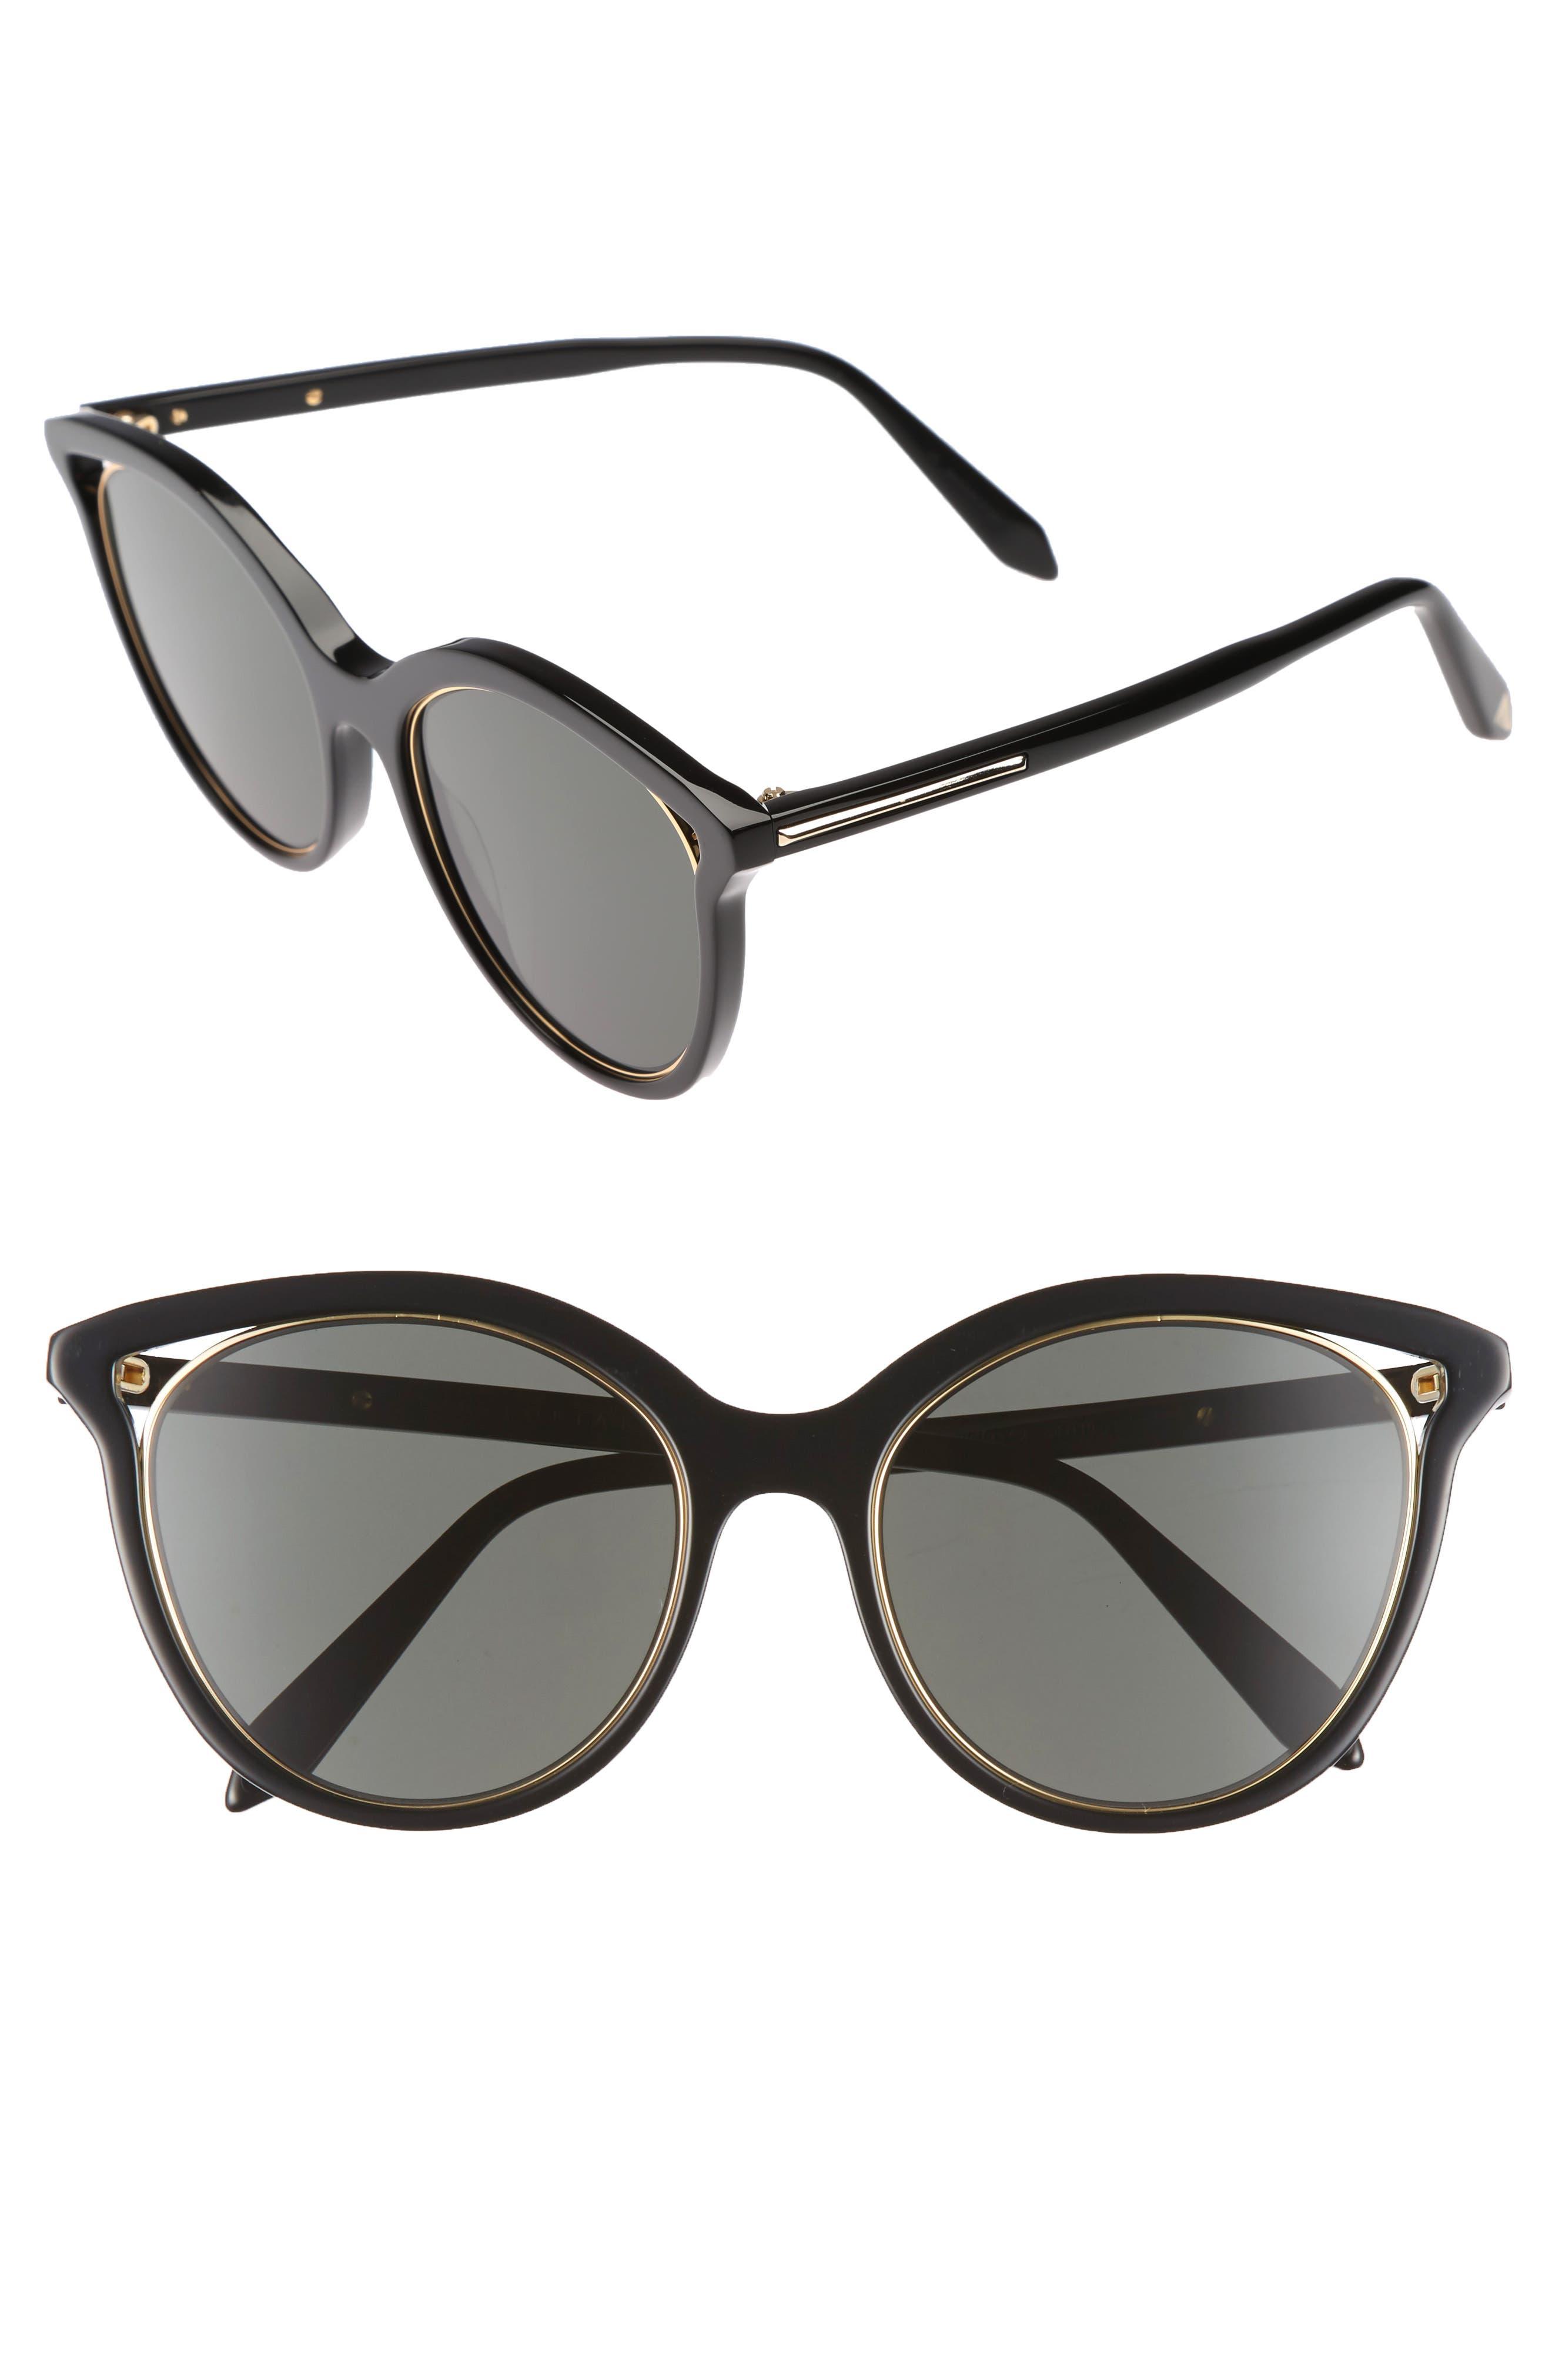 Cutaway Kitten 54mm Cat Eye Sunglasses,                             Main thumbnail 1, color,                             Black/ Gold